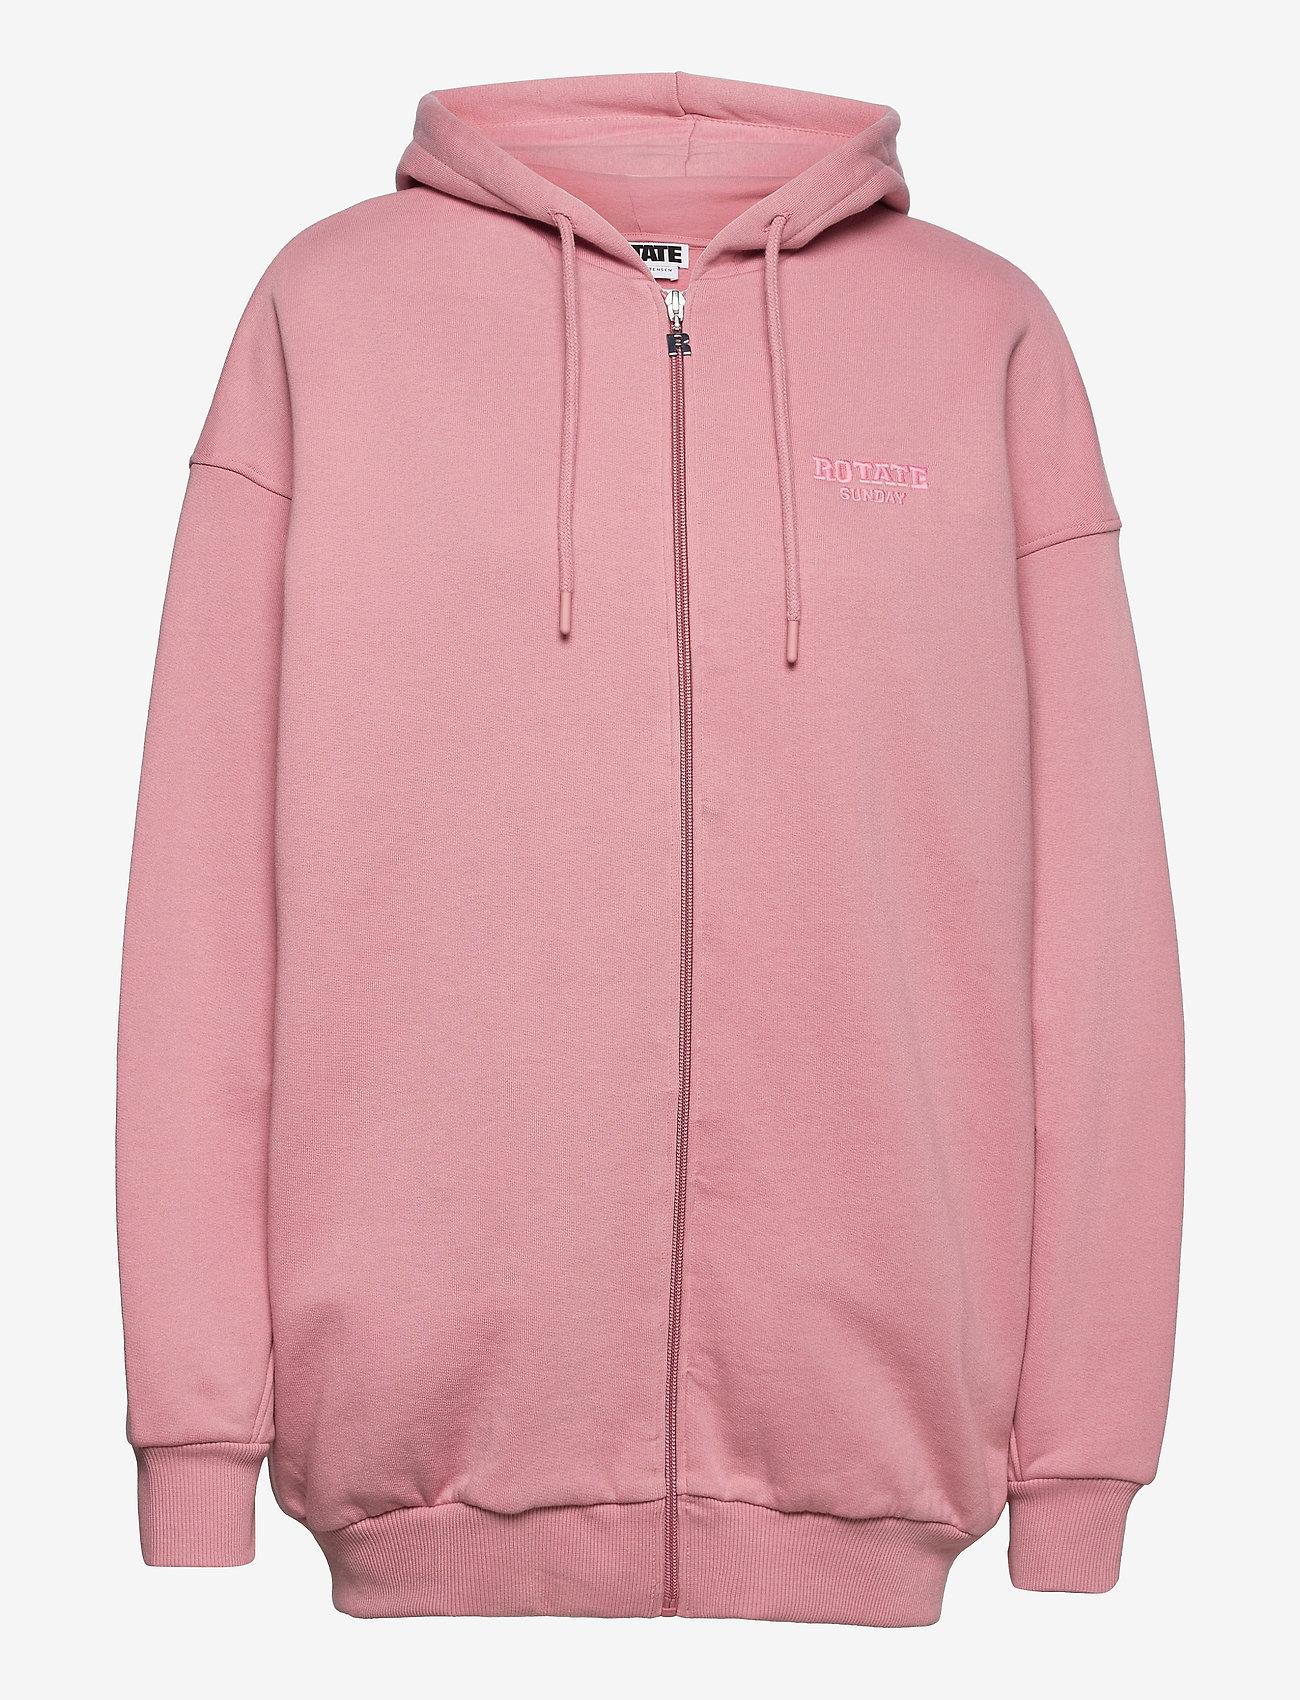 ROTATE Birger Christensen - Selma Hoddie Zip - sweatshirts en hoodies - lilas - 1